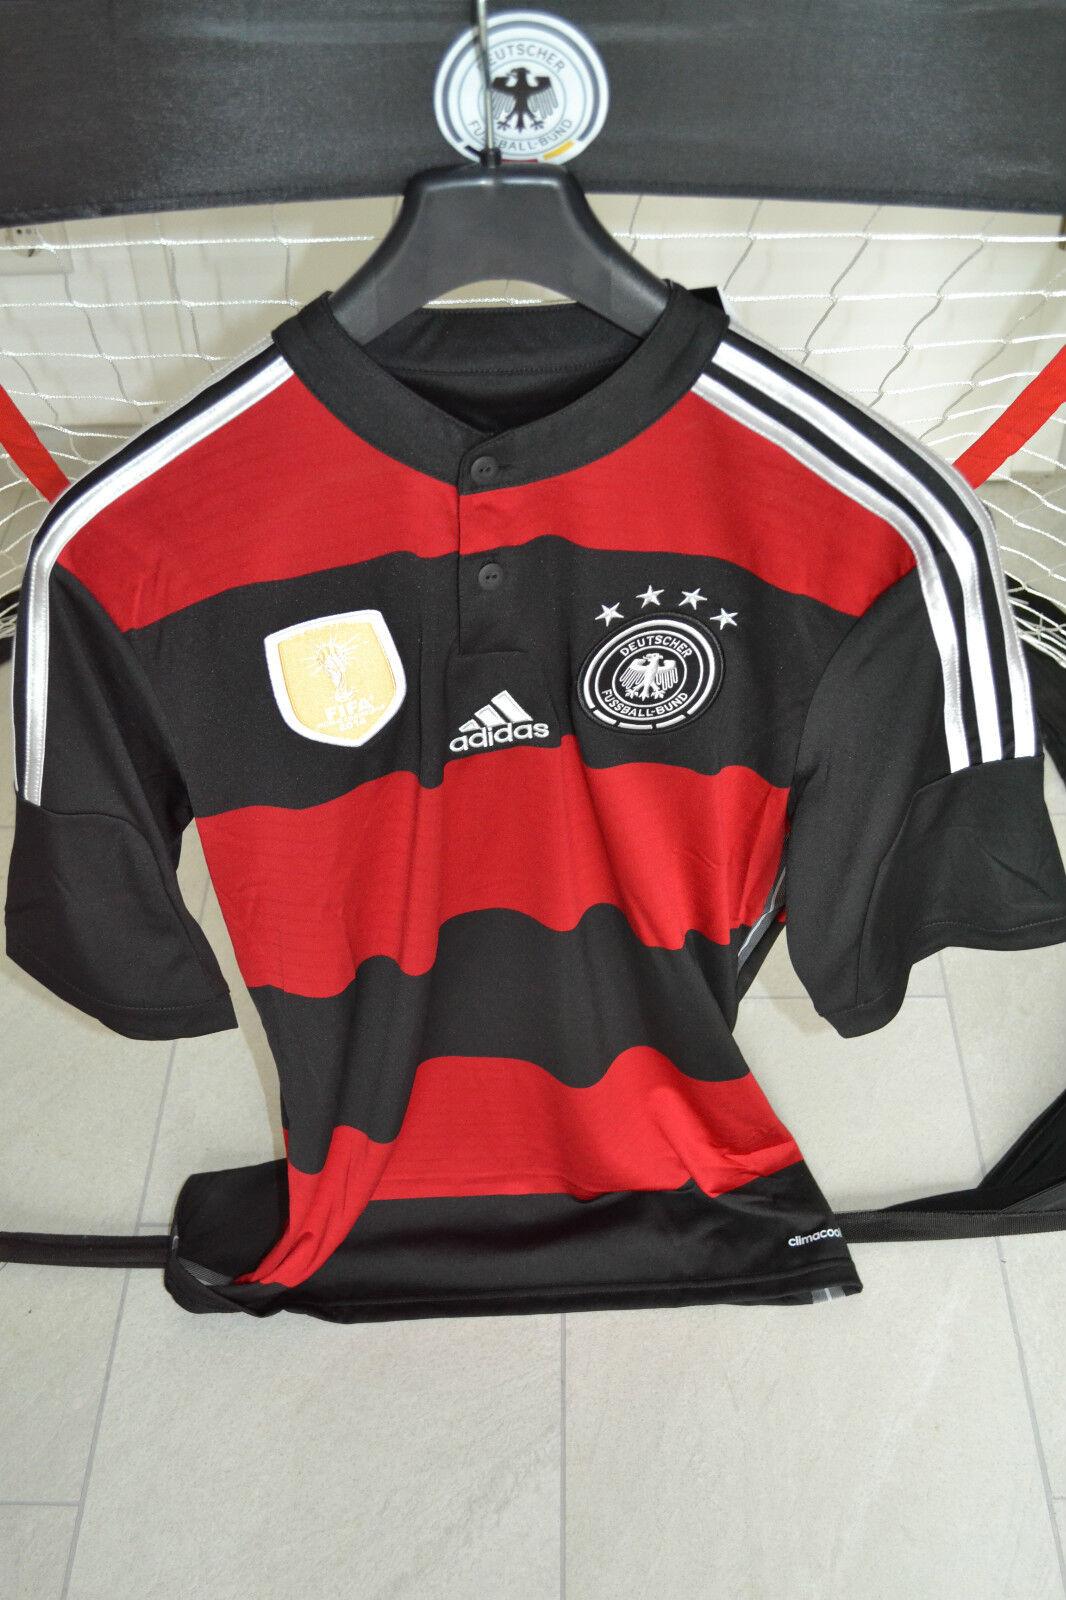 ADIDAS DEUTSCHLAND Trikot AWAY WM 2014 ,S,NEU,4 Sterne,FIFA,ROT,DFB TRIKOT